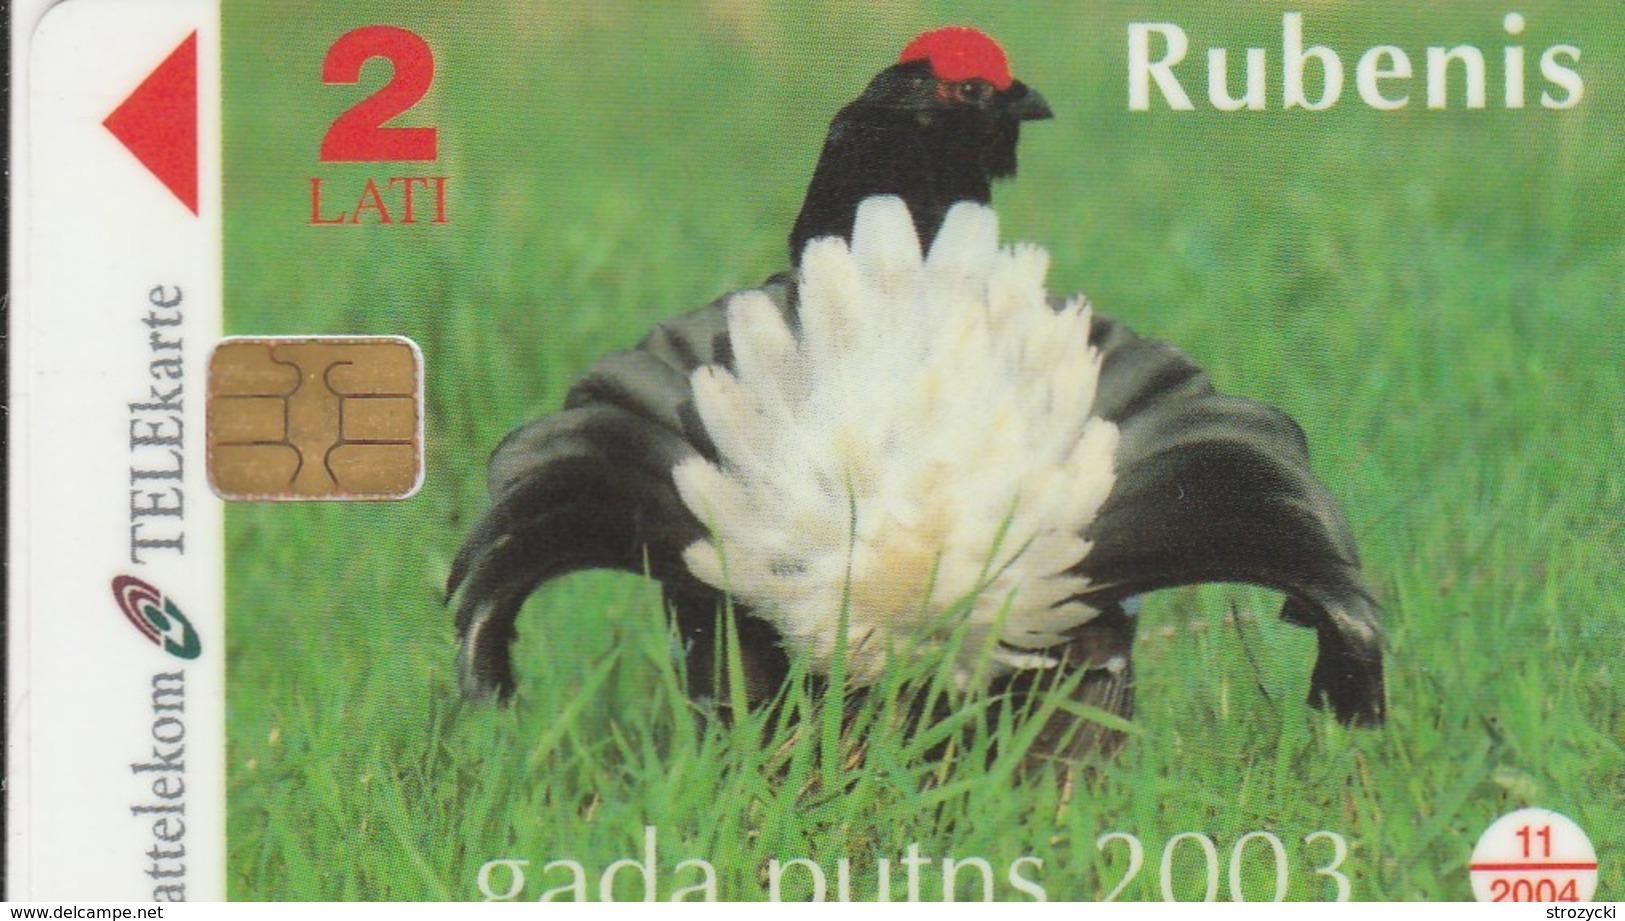 Latvia - Black Grouse - The Bird Of The Year 2003 - 1 - Latvia